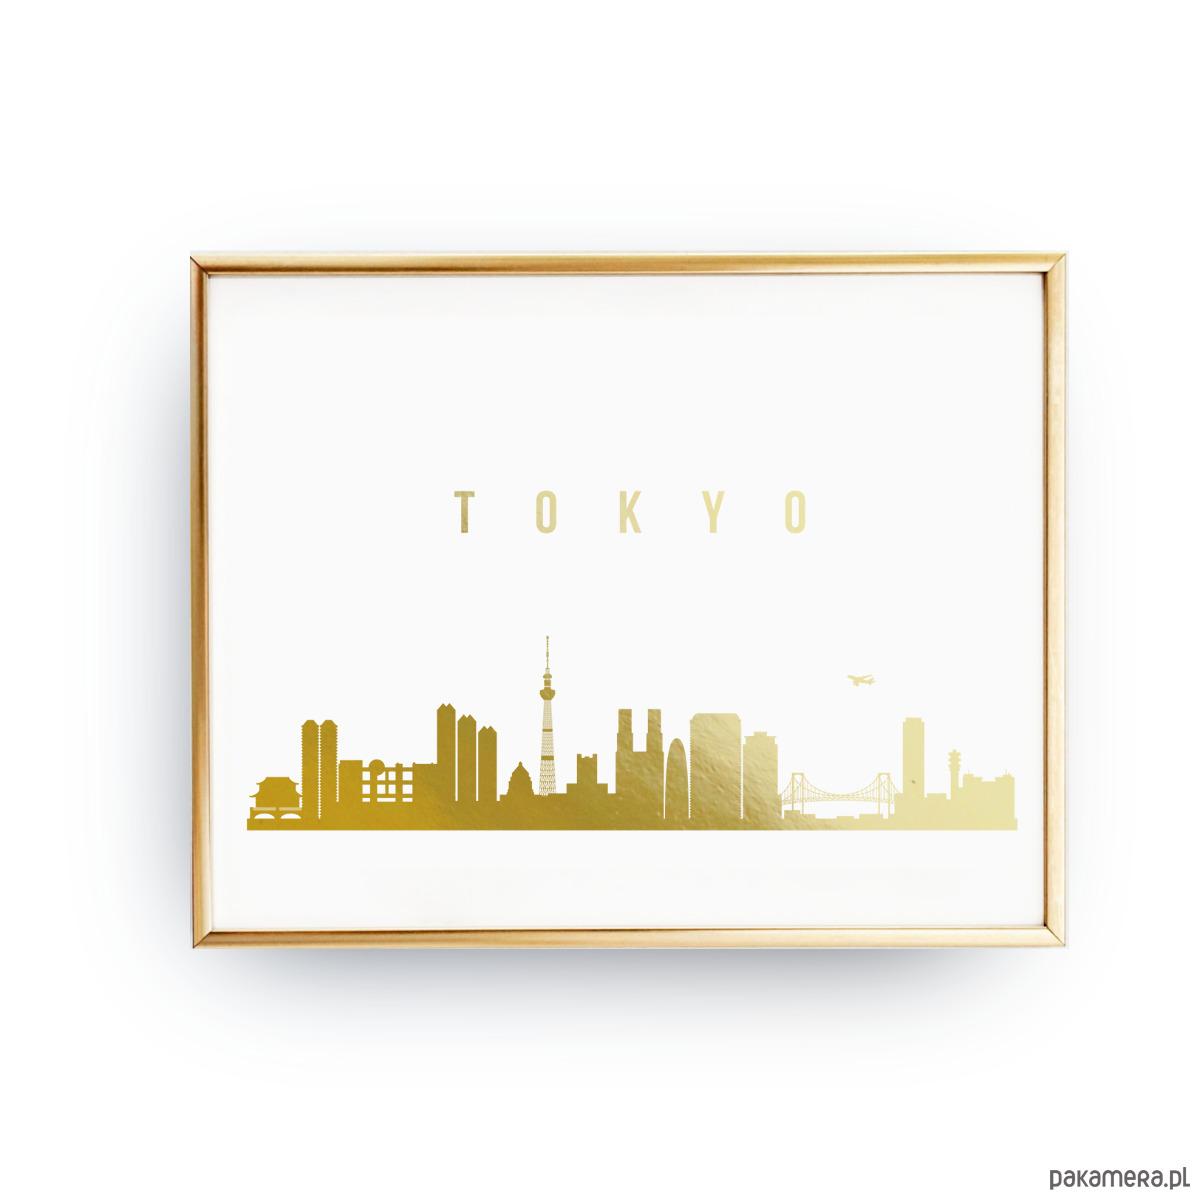 Plakat Tokio Złoty Druk Pakamerapl